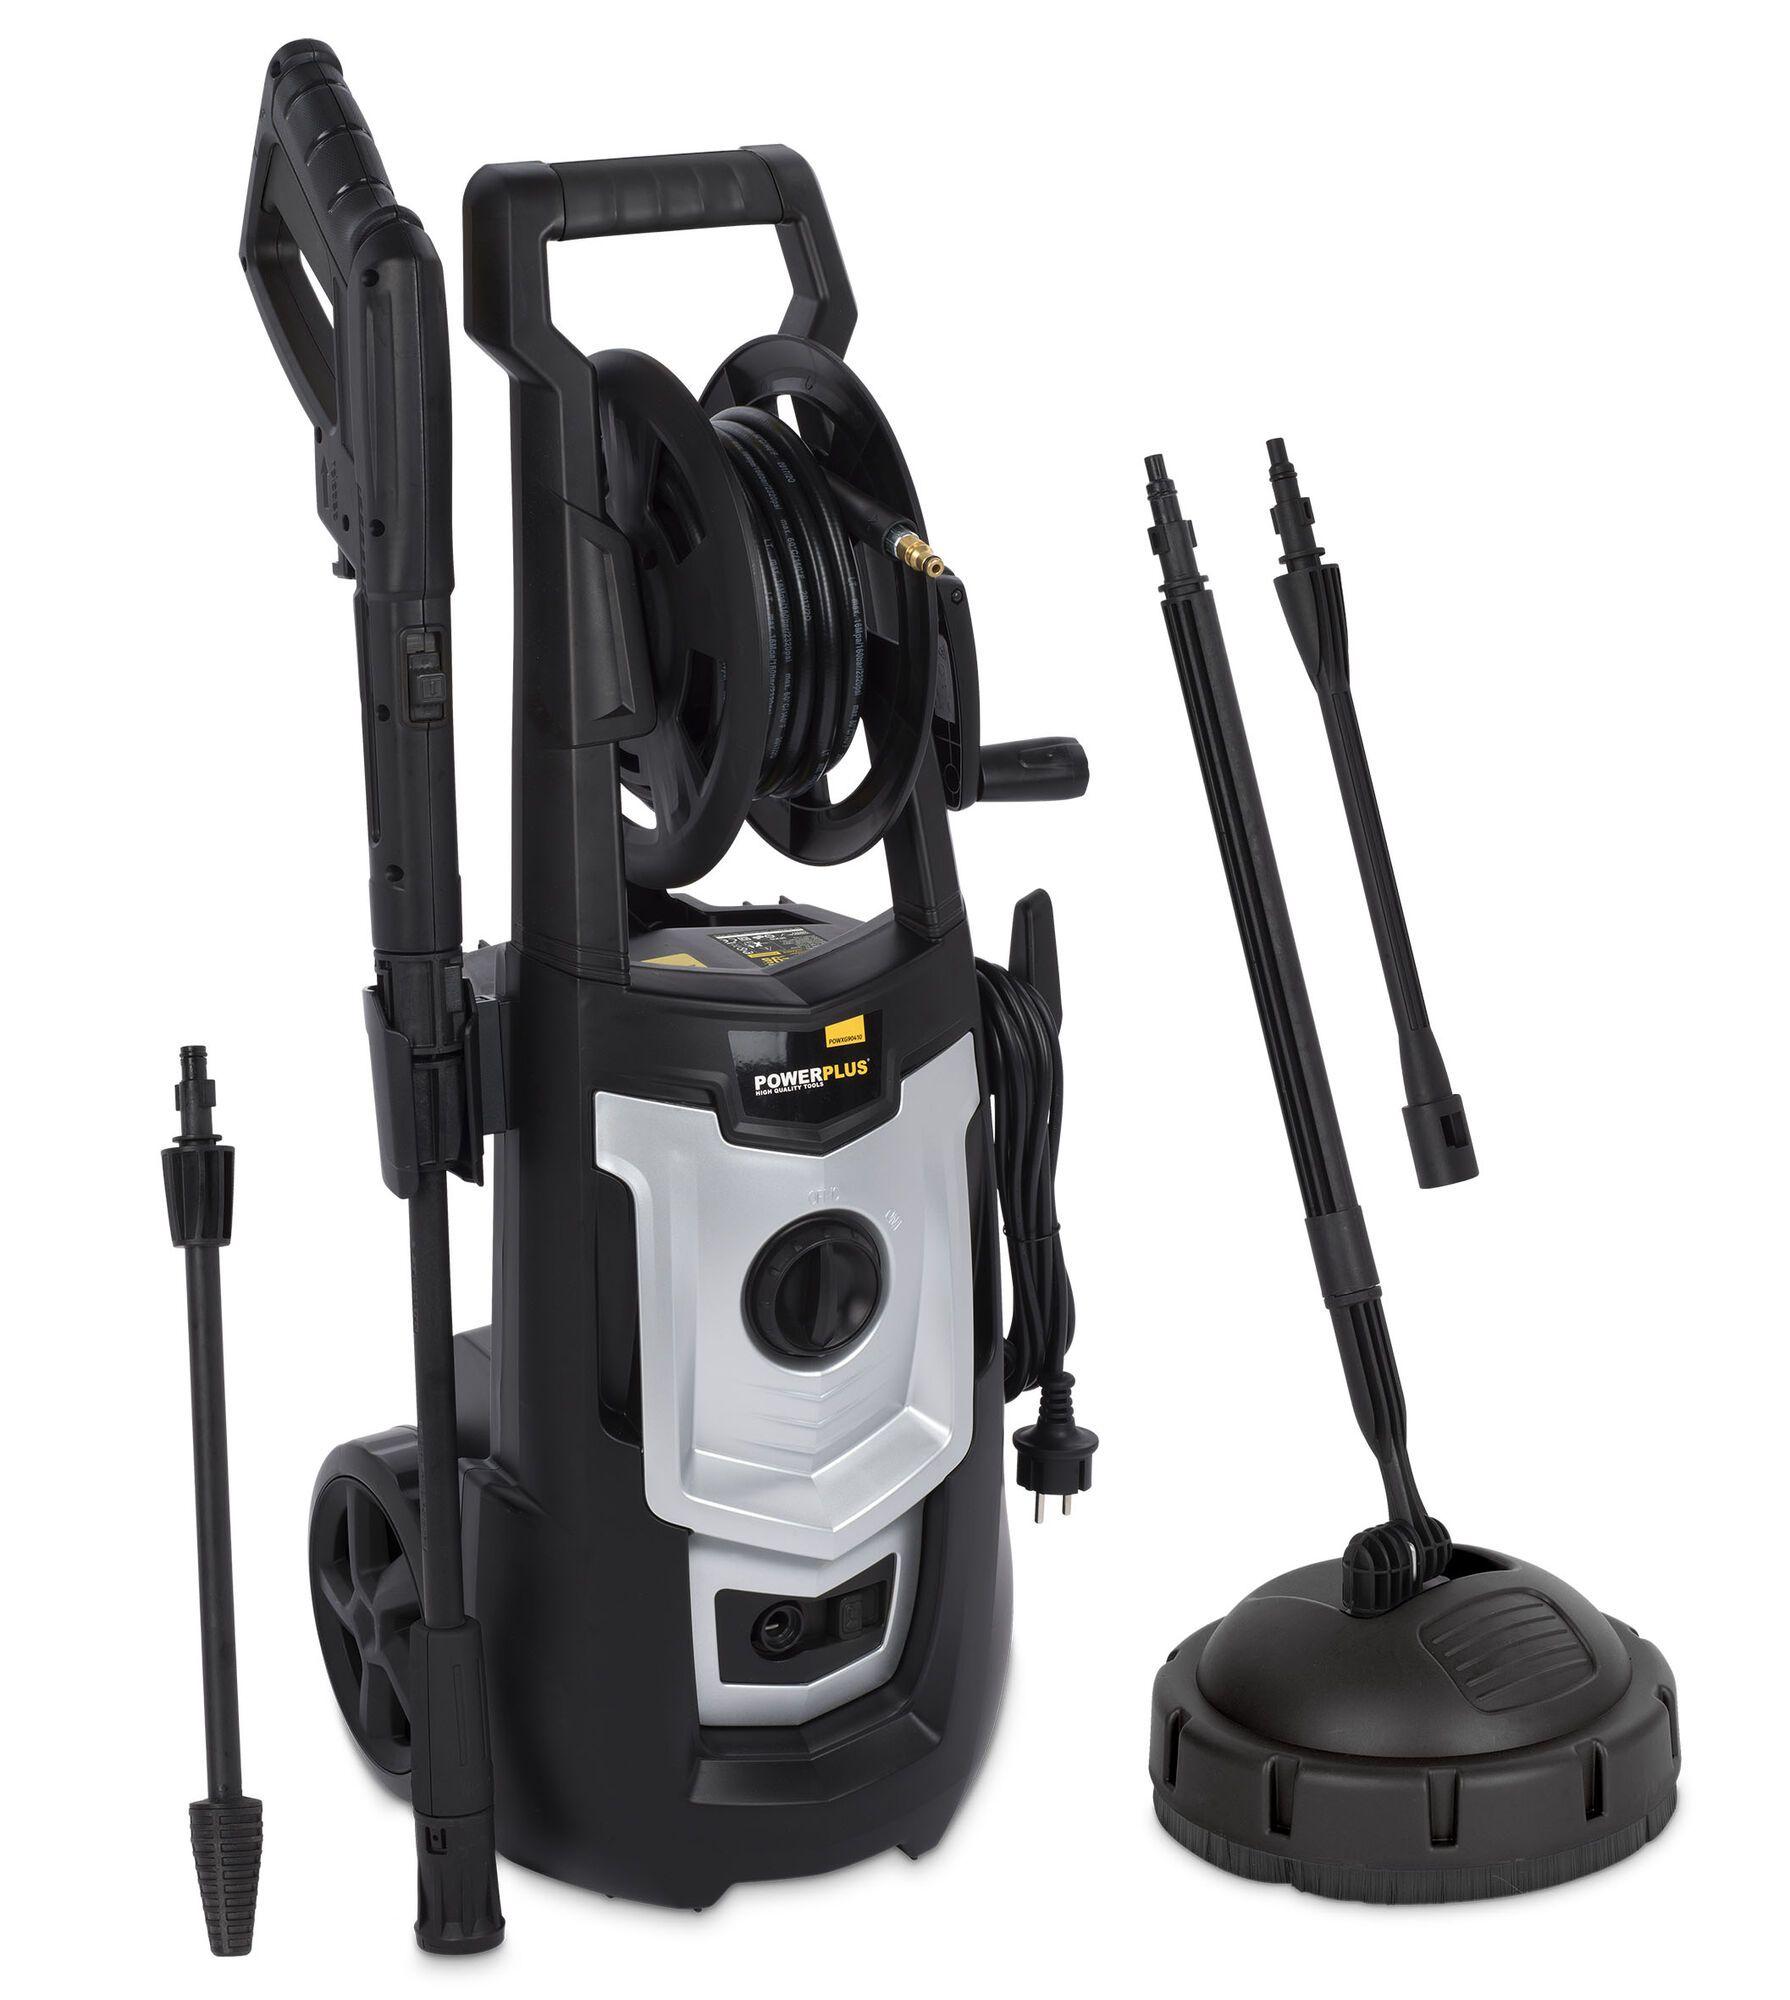 Powerplus POWXG90410 Elektrisch Hogedrukreiniger   Hogedrukspuit (hogedrukreinigers elektrisch)